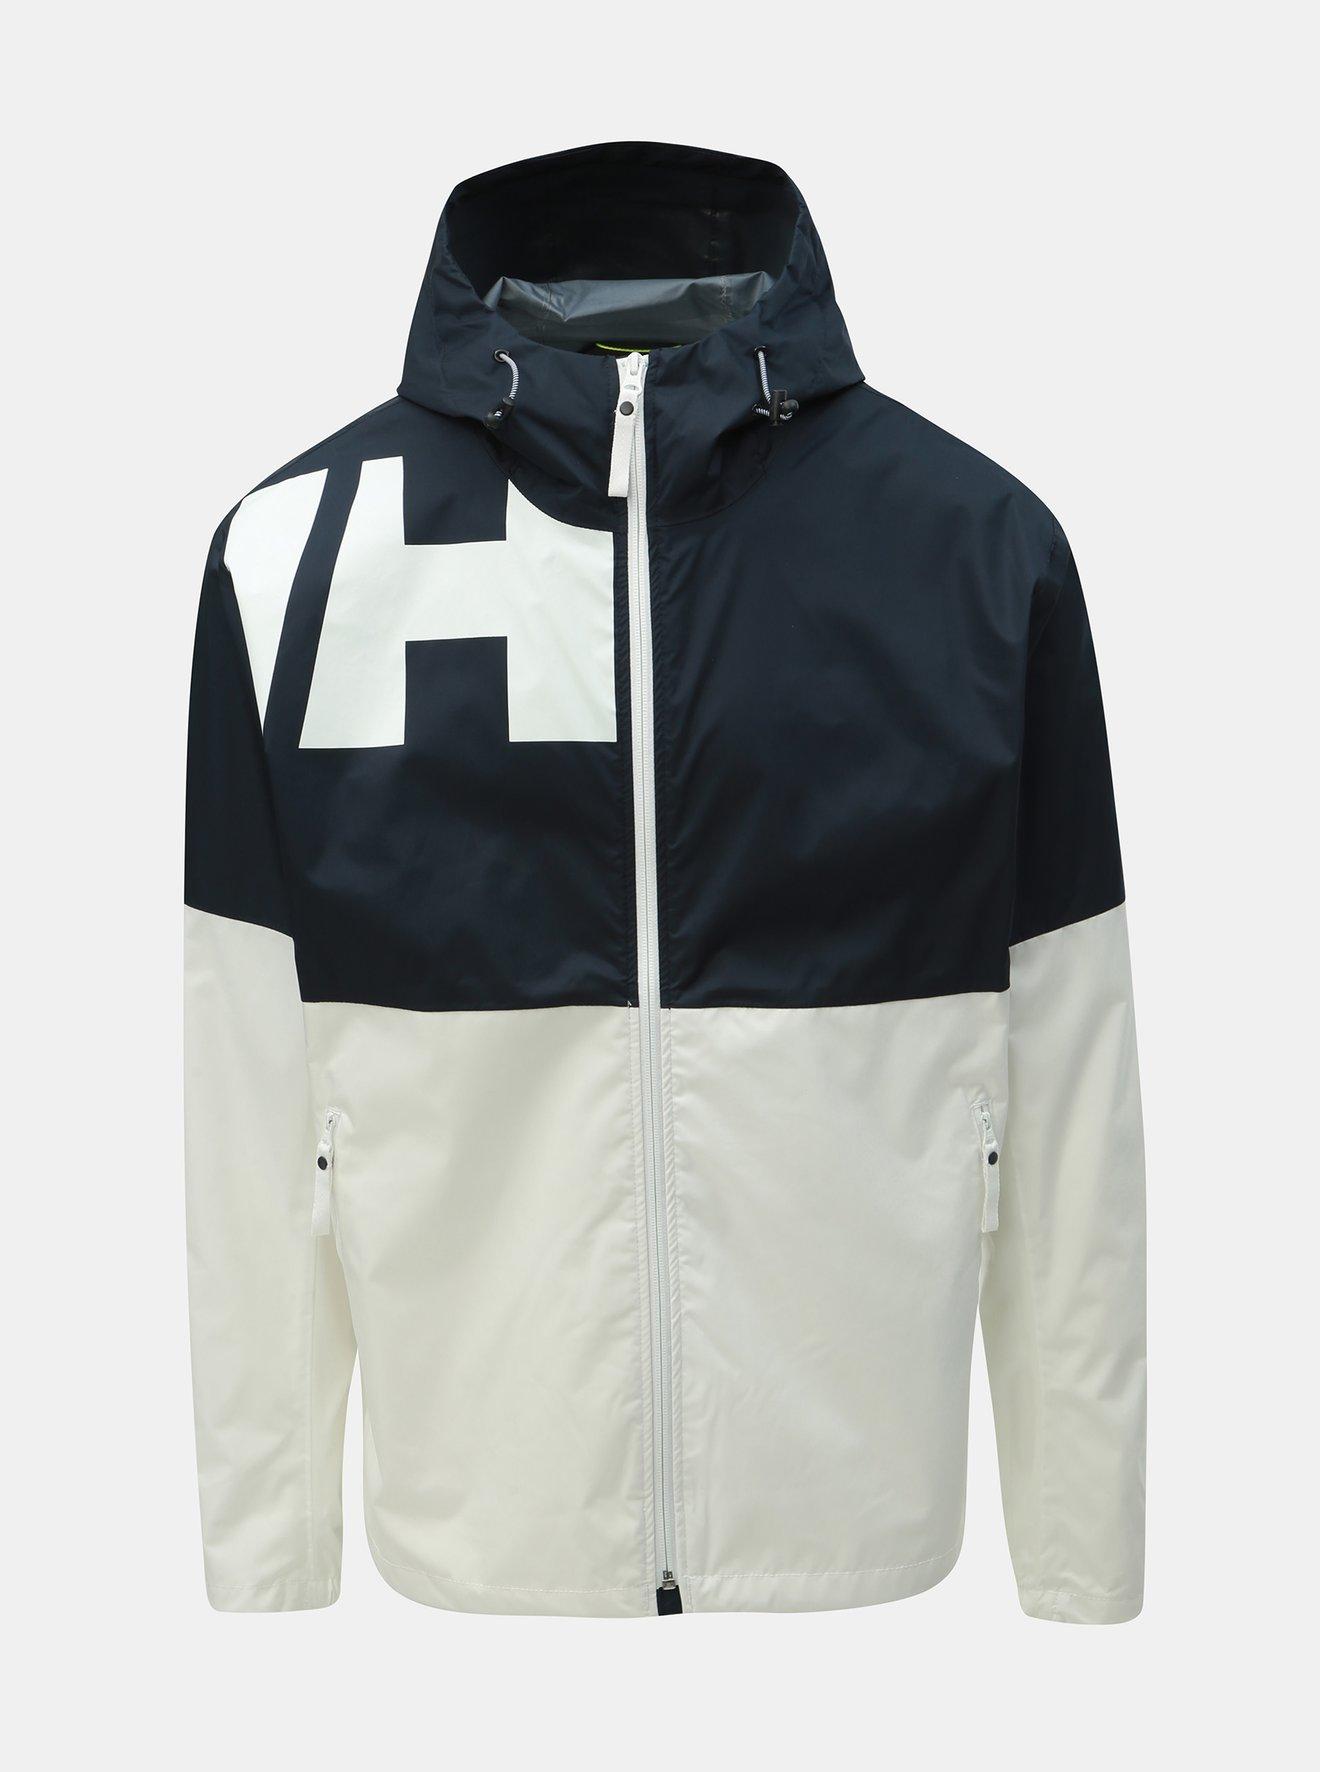 Modro-bílá pánská nepromokavá lehká bunda HELLY HANSEN